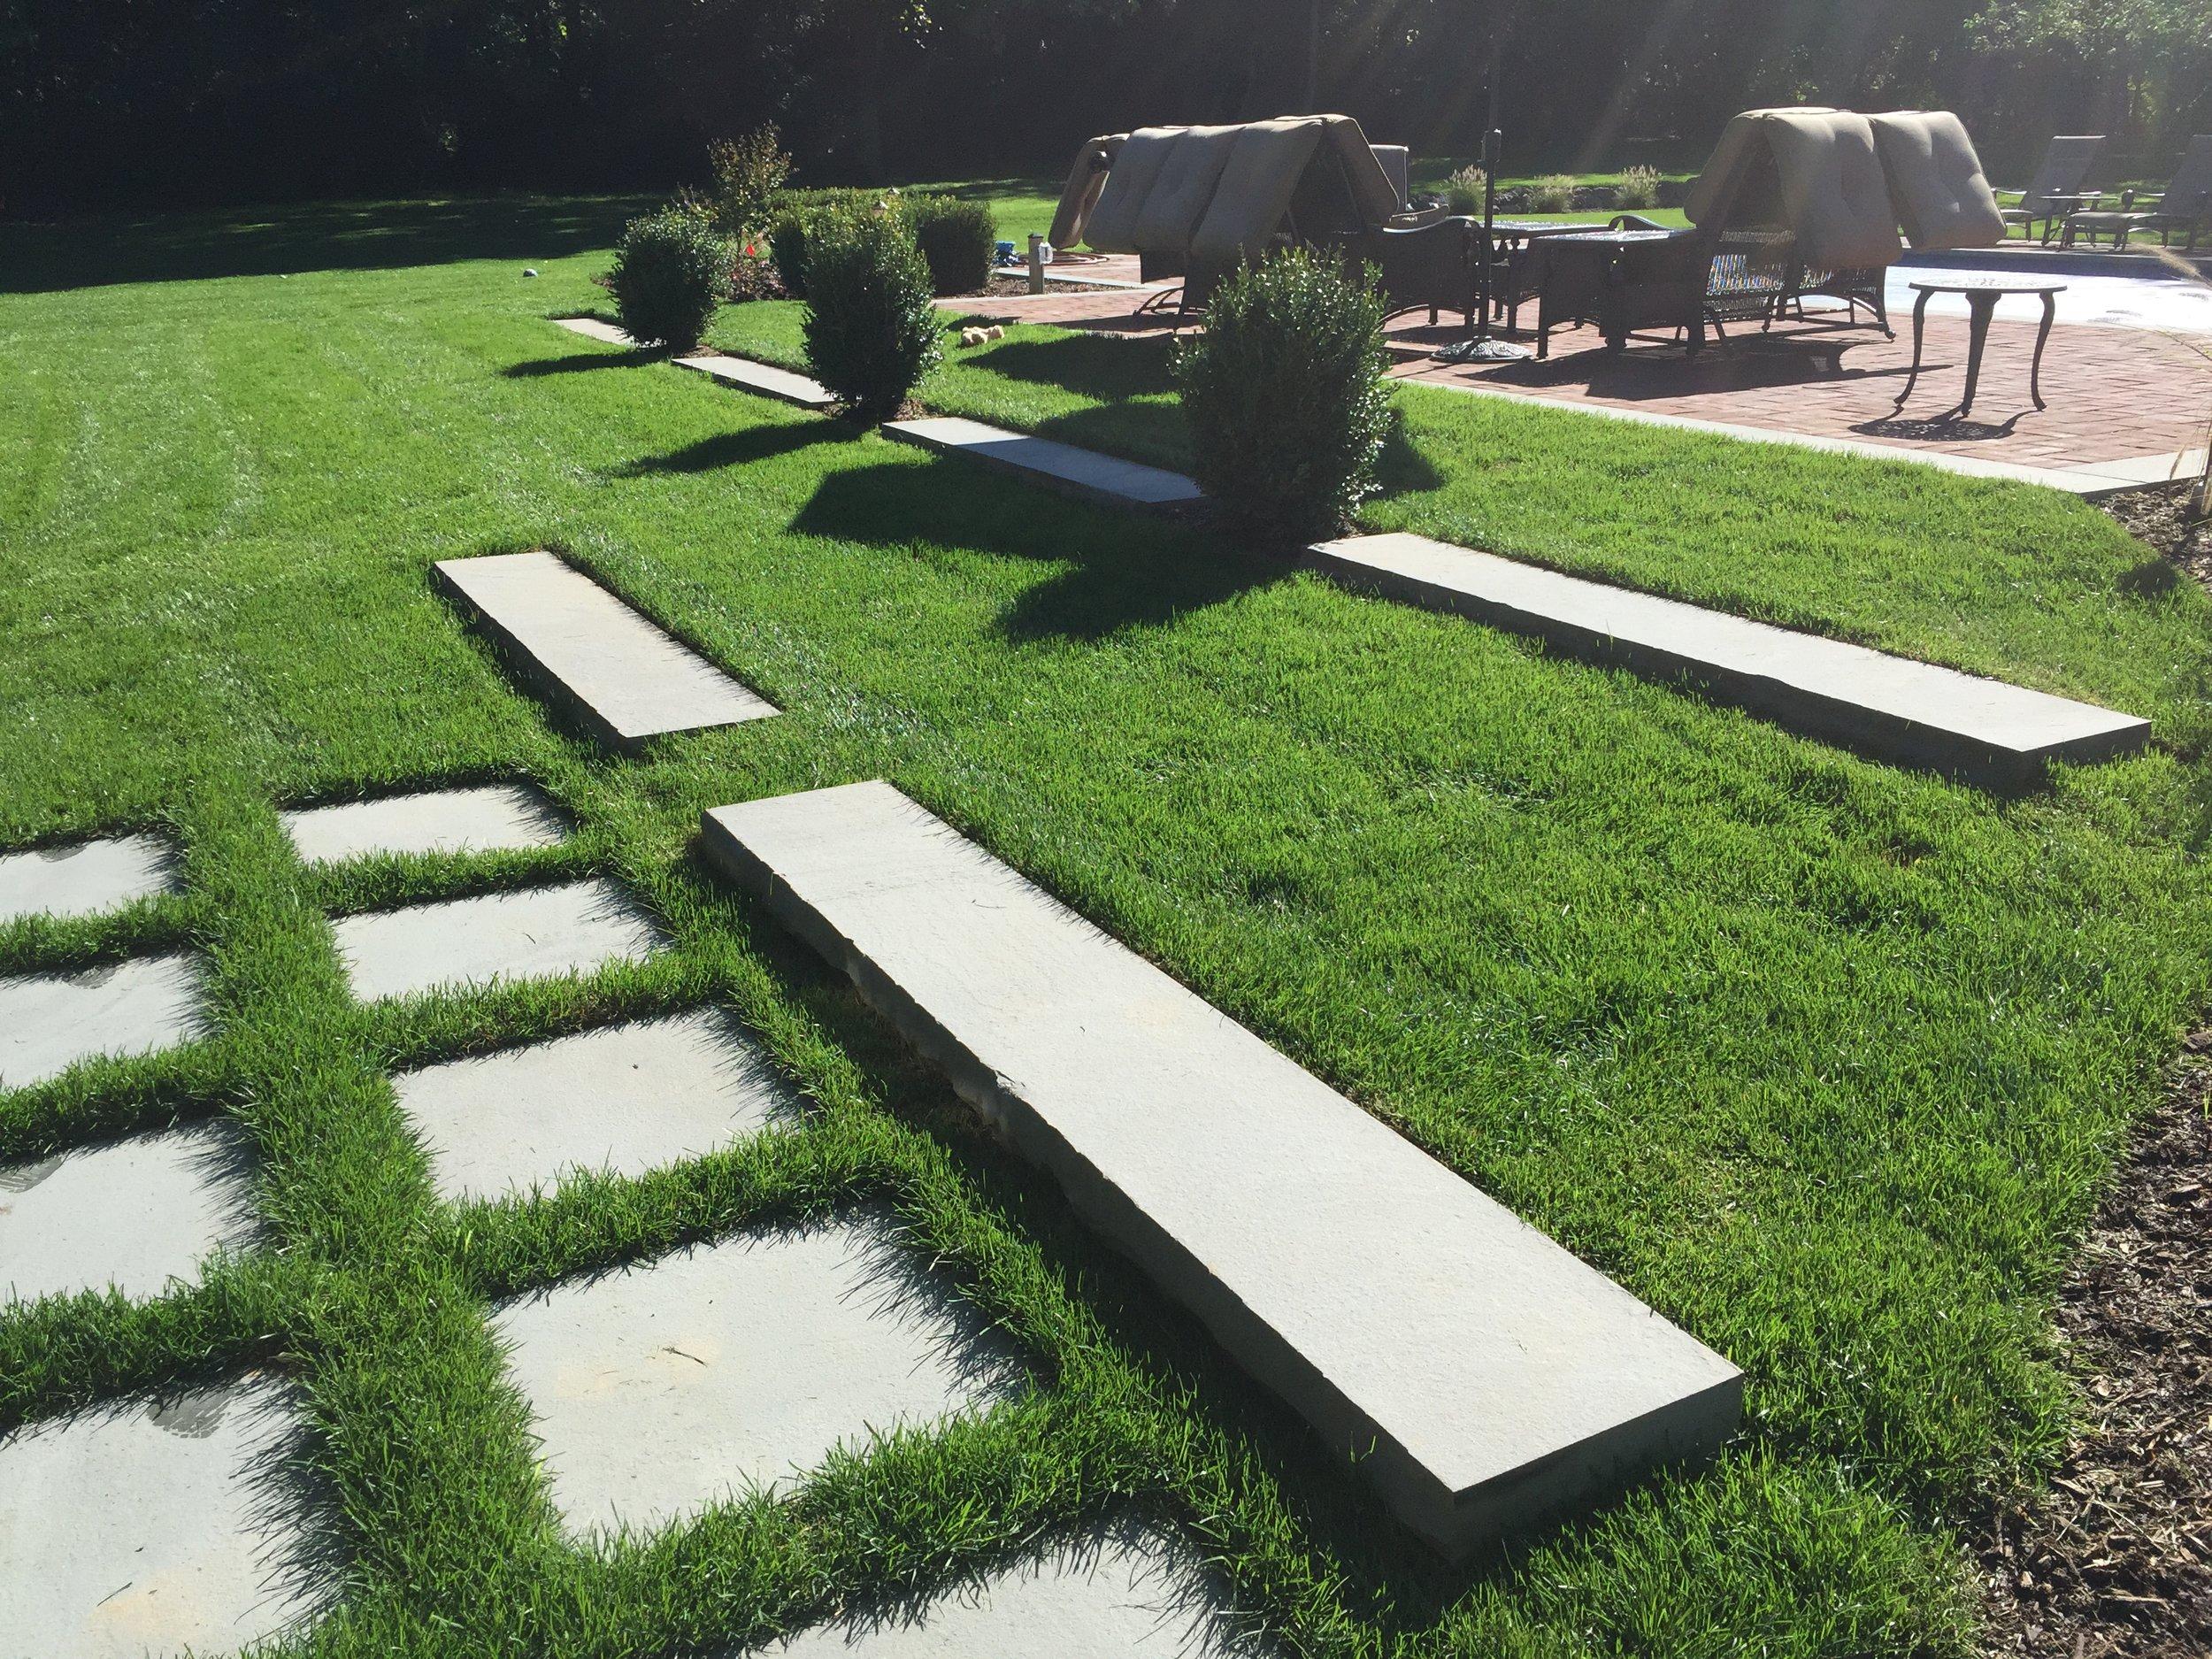 Professional walkway landscape design company in Long Island, NY